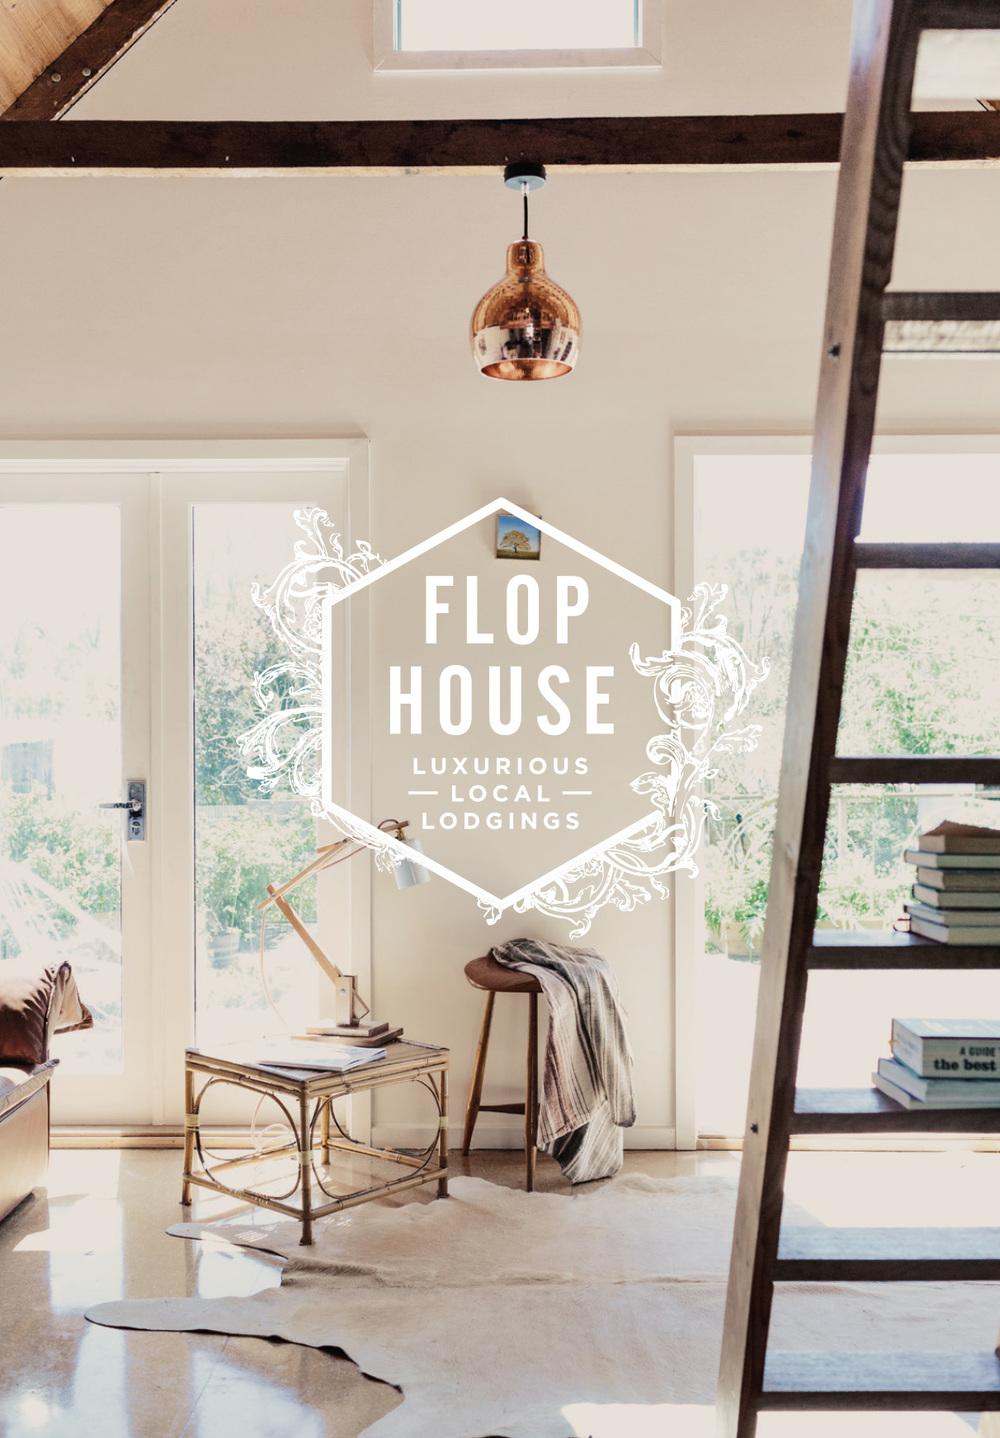 FlopHouse_A6_POSTCARD_2014_5-1.jpg